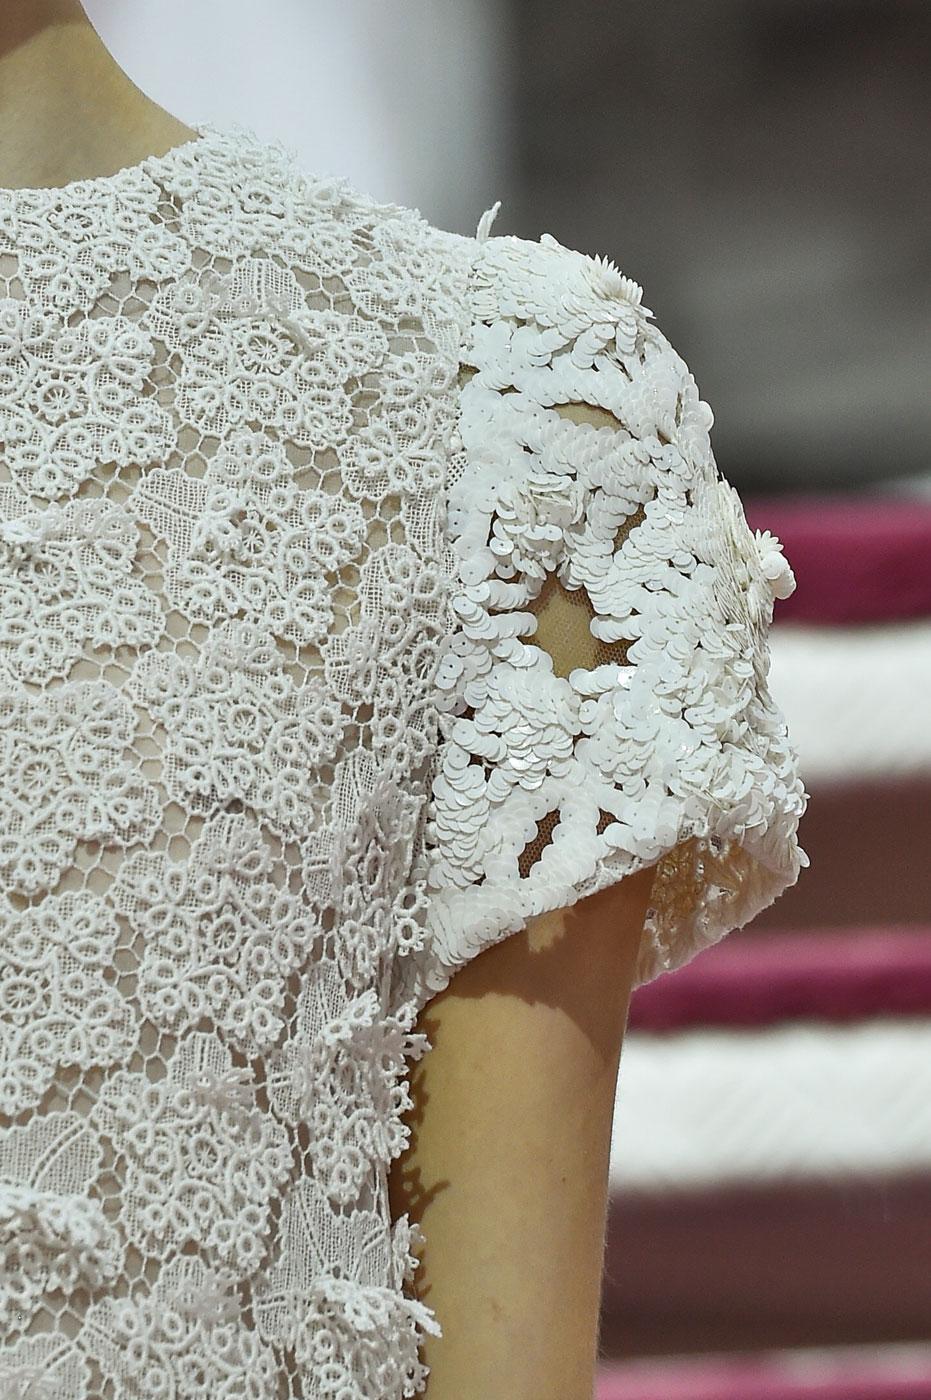 Christian-Dior-fashion-runway-show-close-ups-haute-couture-paris-spring-summer-2015-the-impression-135